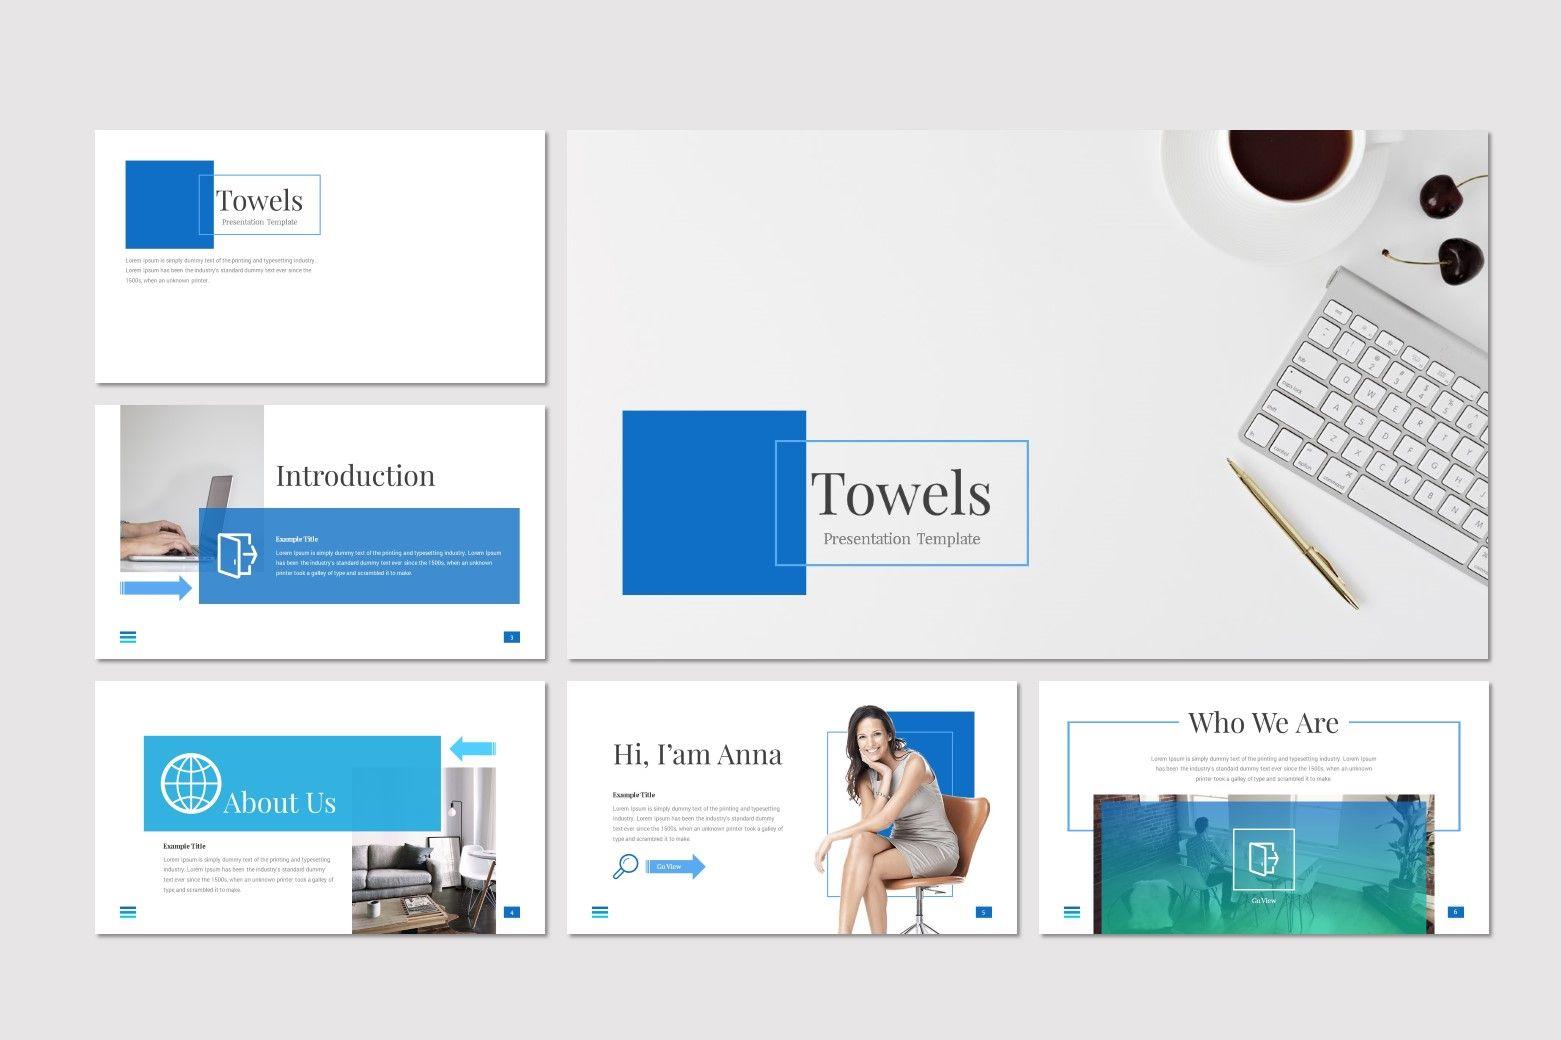 Towels - PowerPoint Template, Slide 2, 08545, Presentation Templates — PoweredTemplate.com